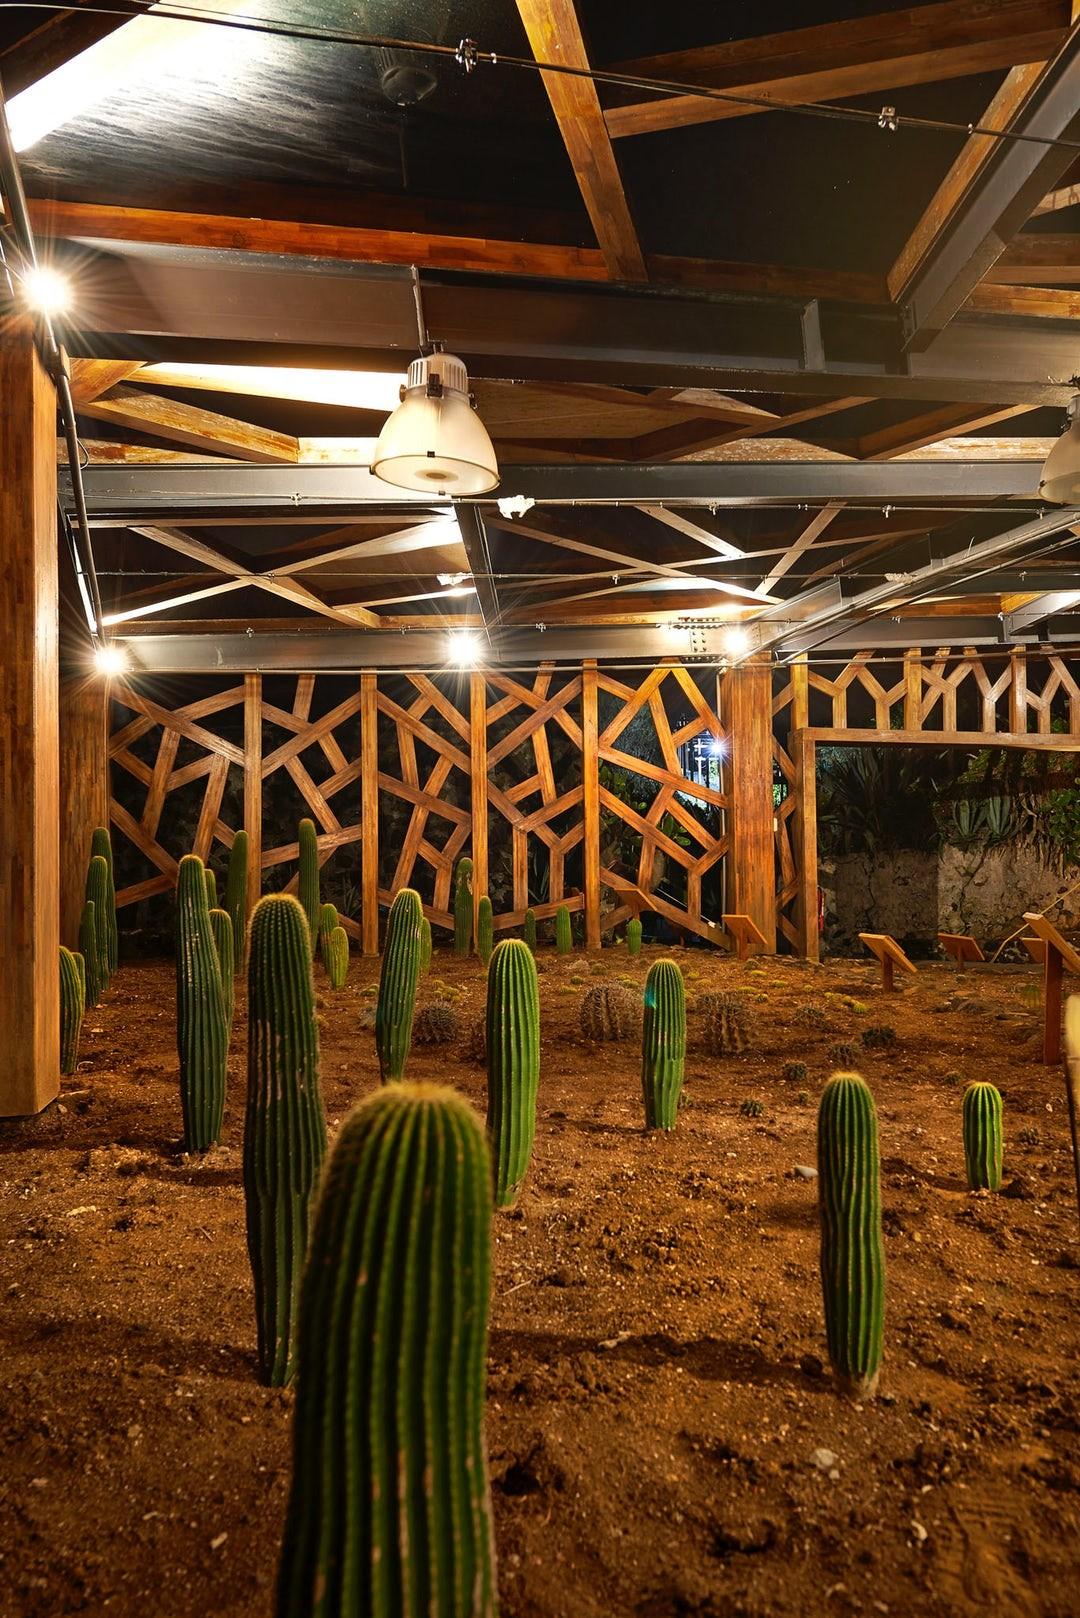 Penghu Qingwan Cactus Park by CCL Architects & Planners, Penghu County, Taiwan